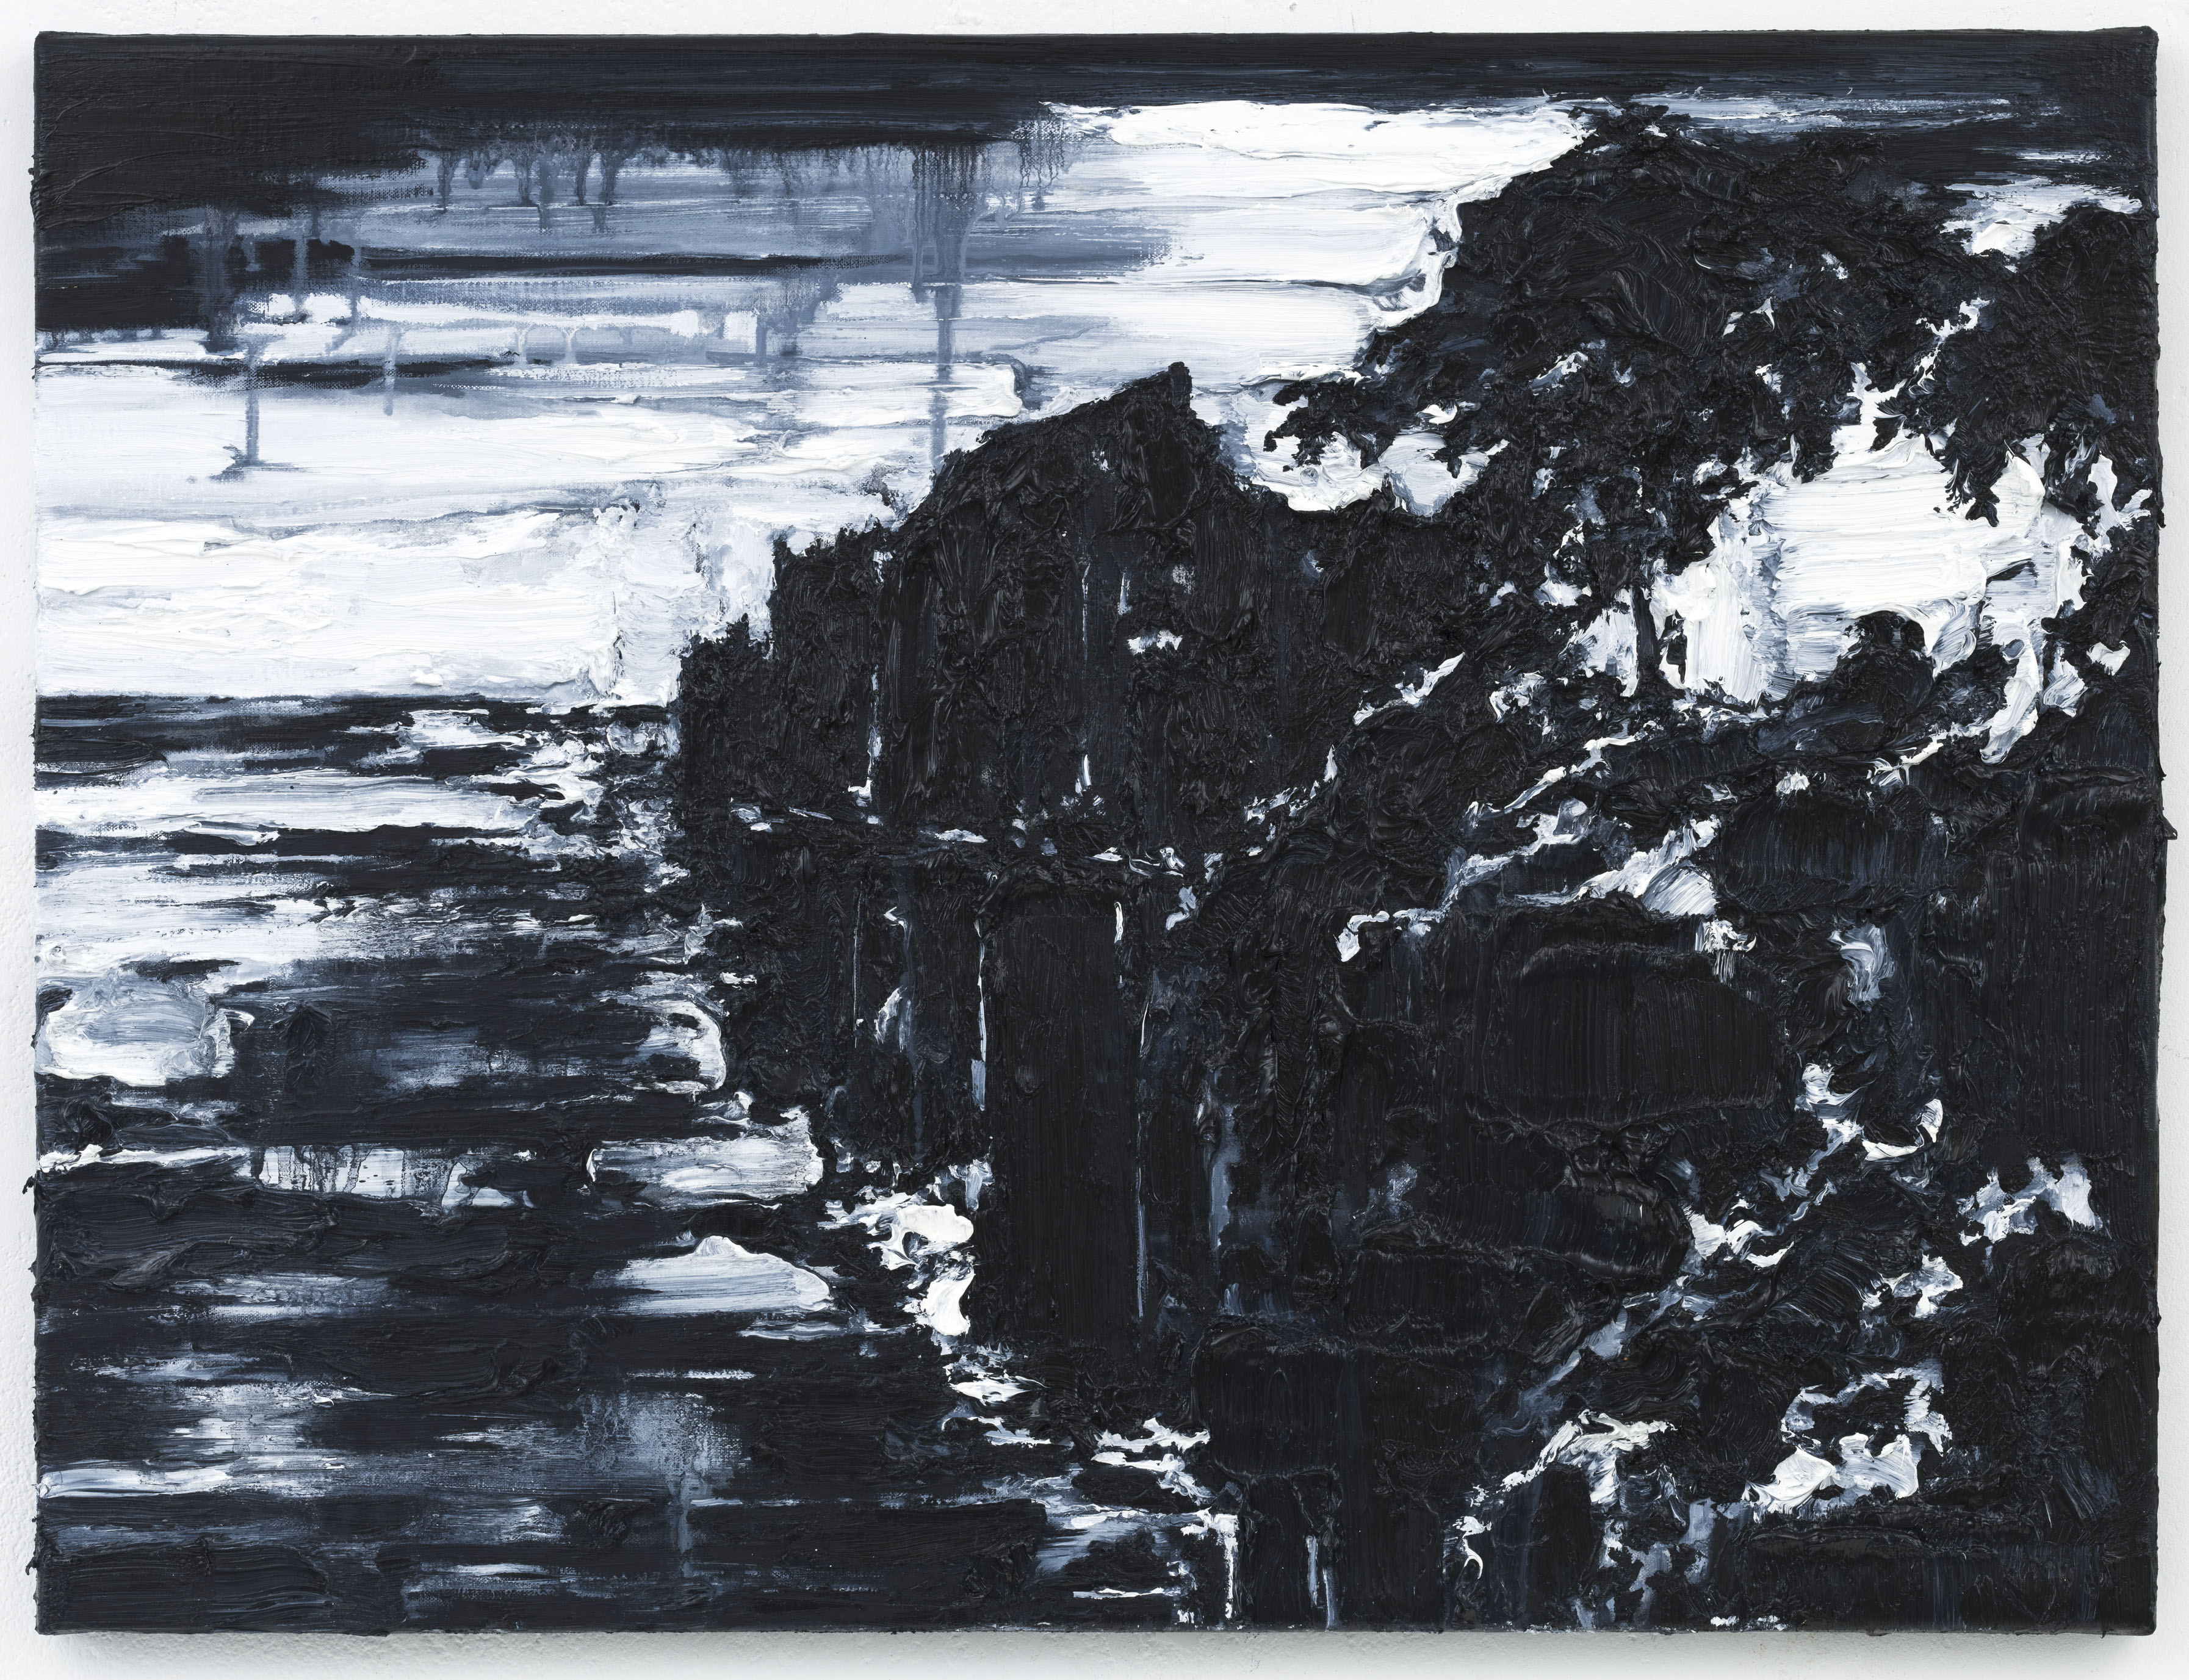 """Cascais"" 60 x 80 cm. oil on linen 2012"